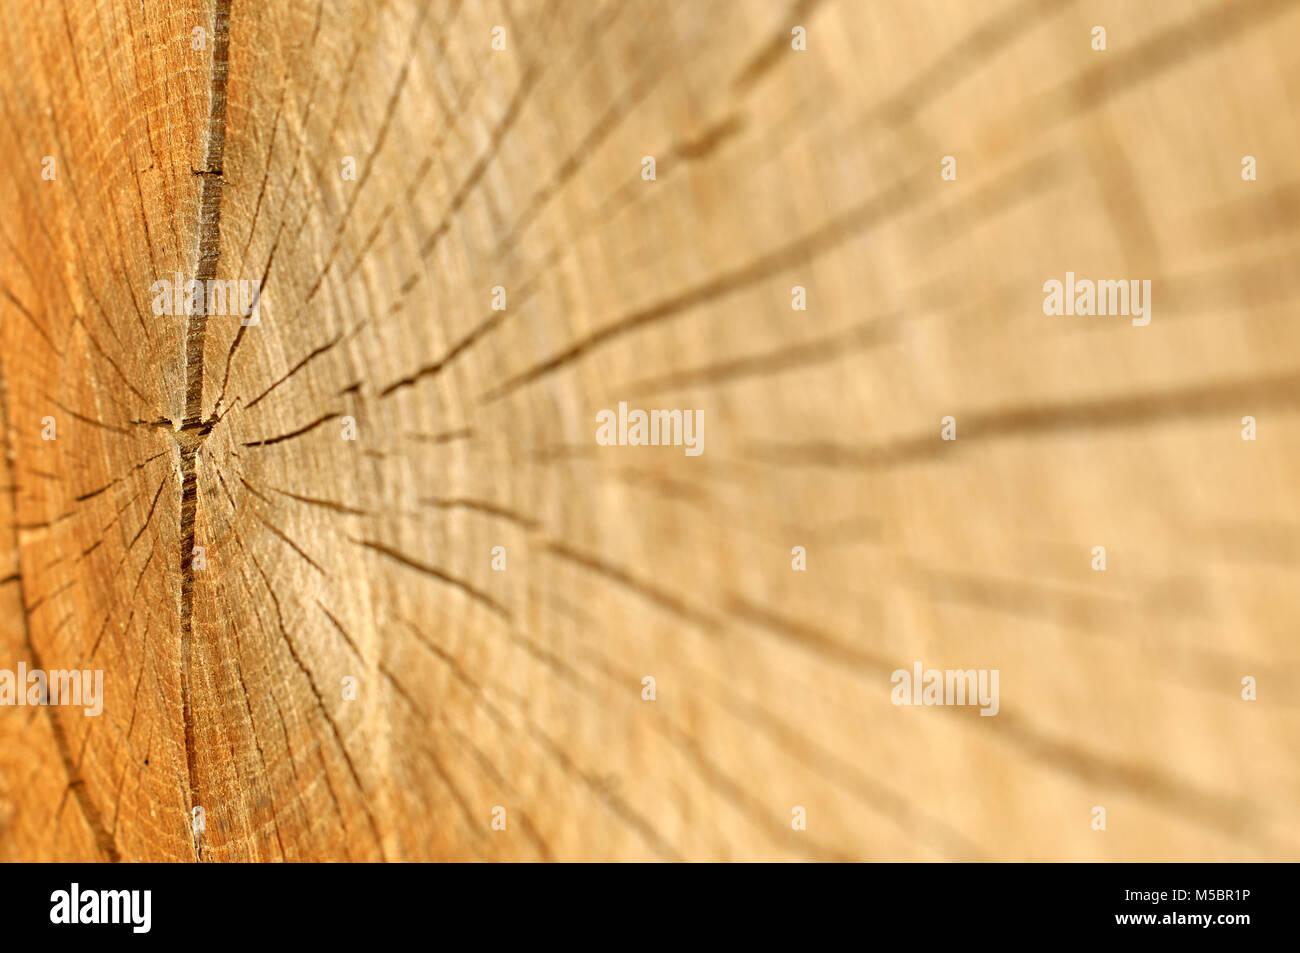 Holzmaserung Hervorheben rohstoff stock photos rohstoff stock images alamy